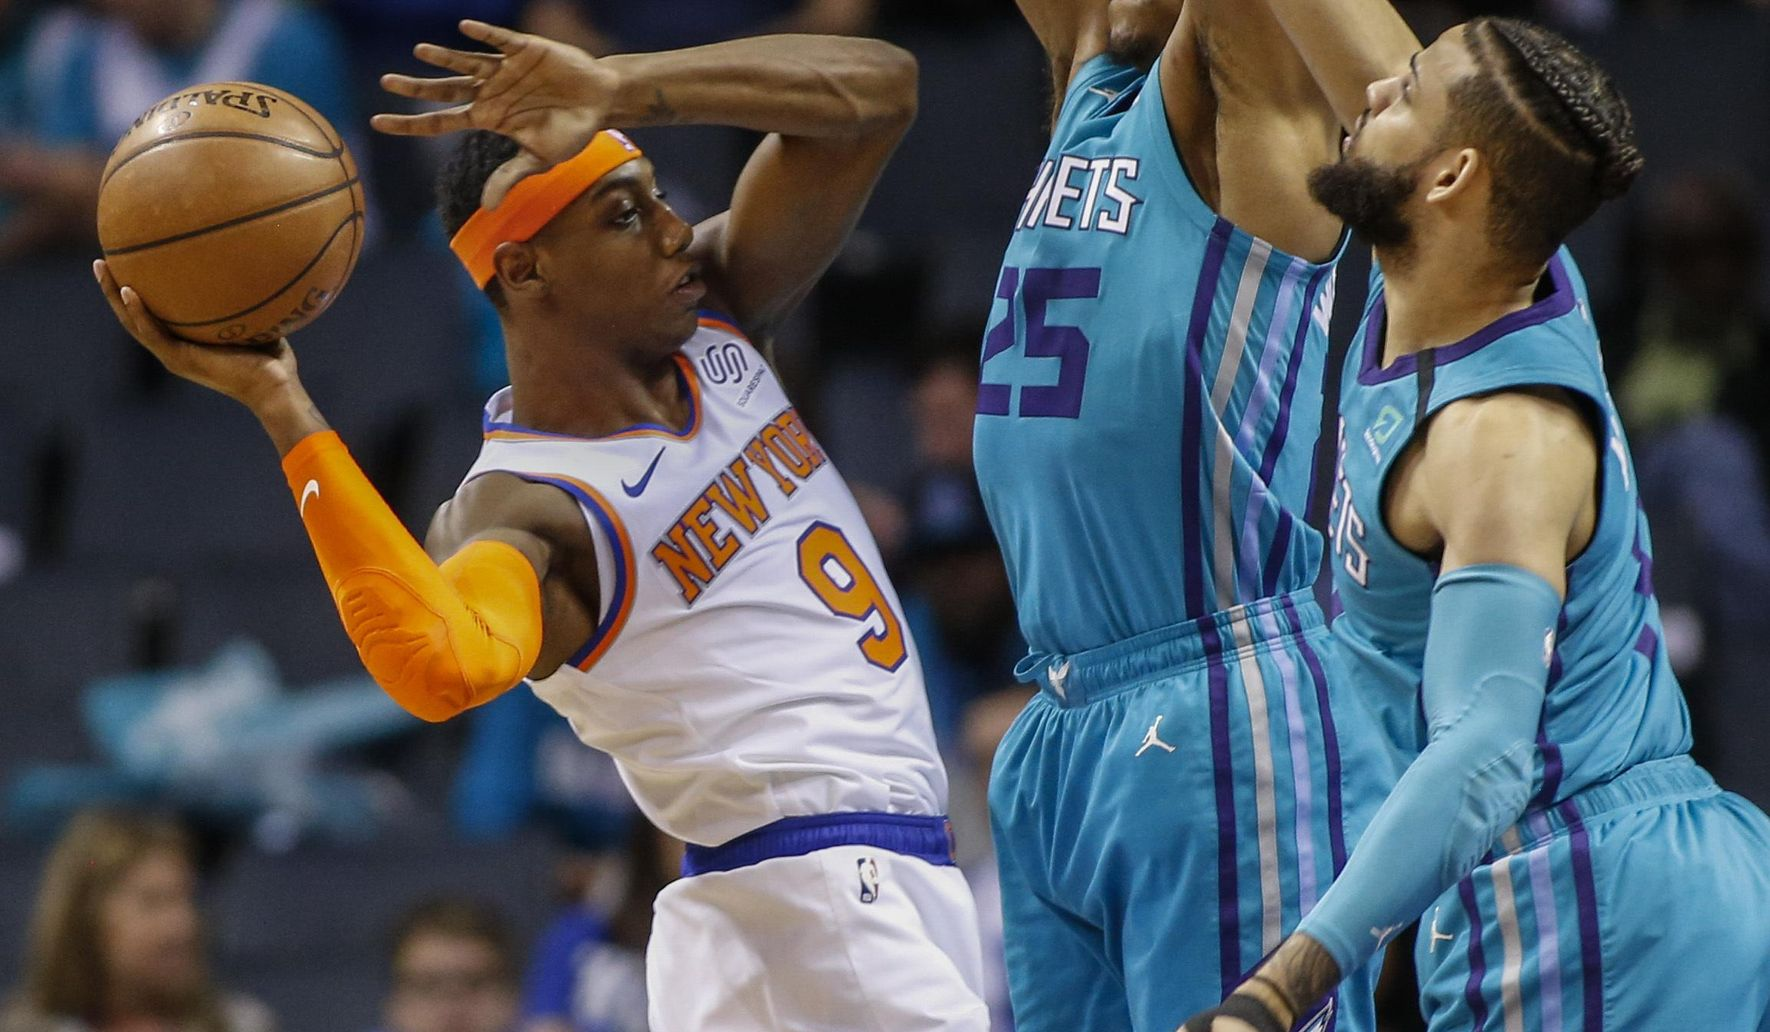 Knicks_hornets_basketball_27450_c0-1056-2304-2399_s1770x1032